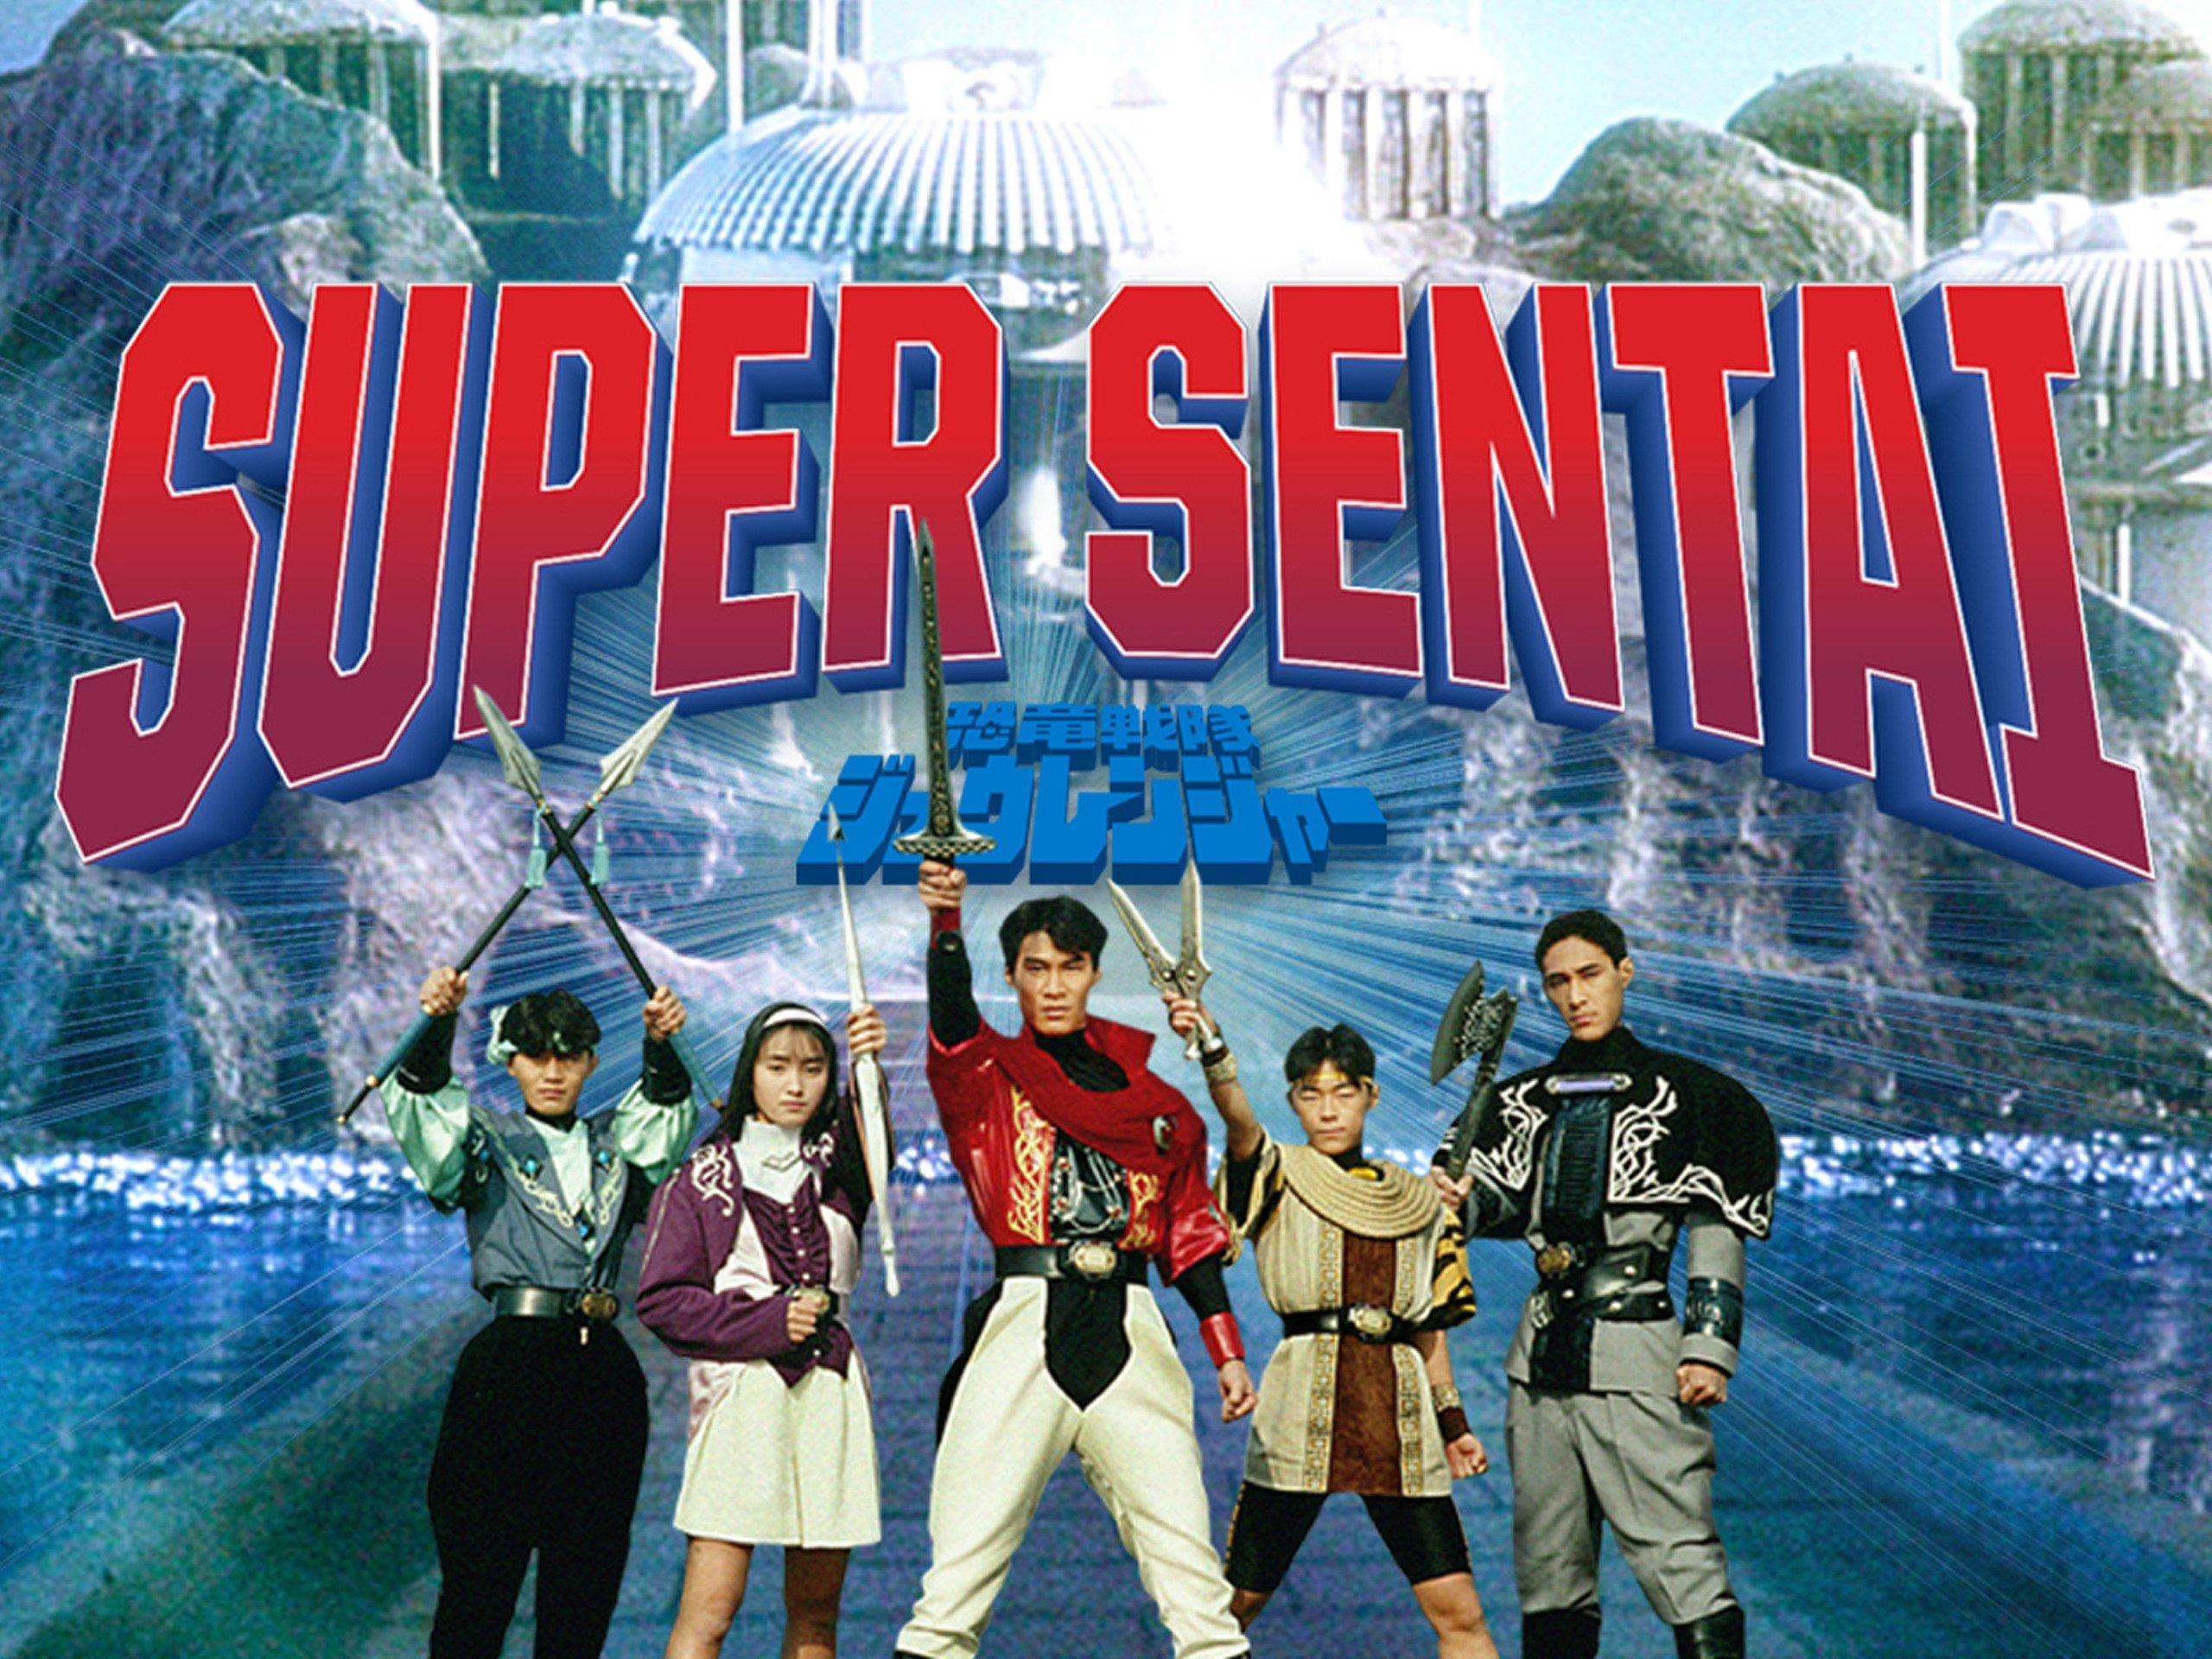 Watch Super Sentai Zyuranger Season one (English Subtitled